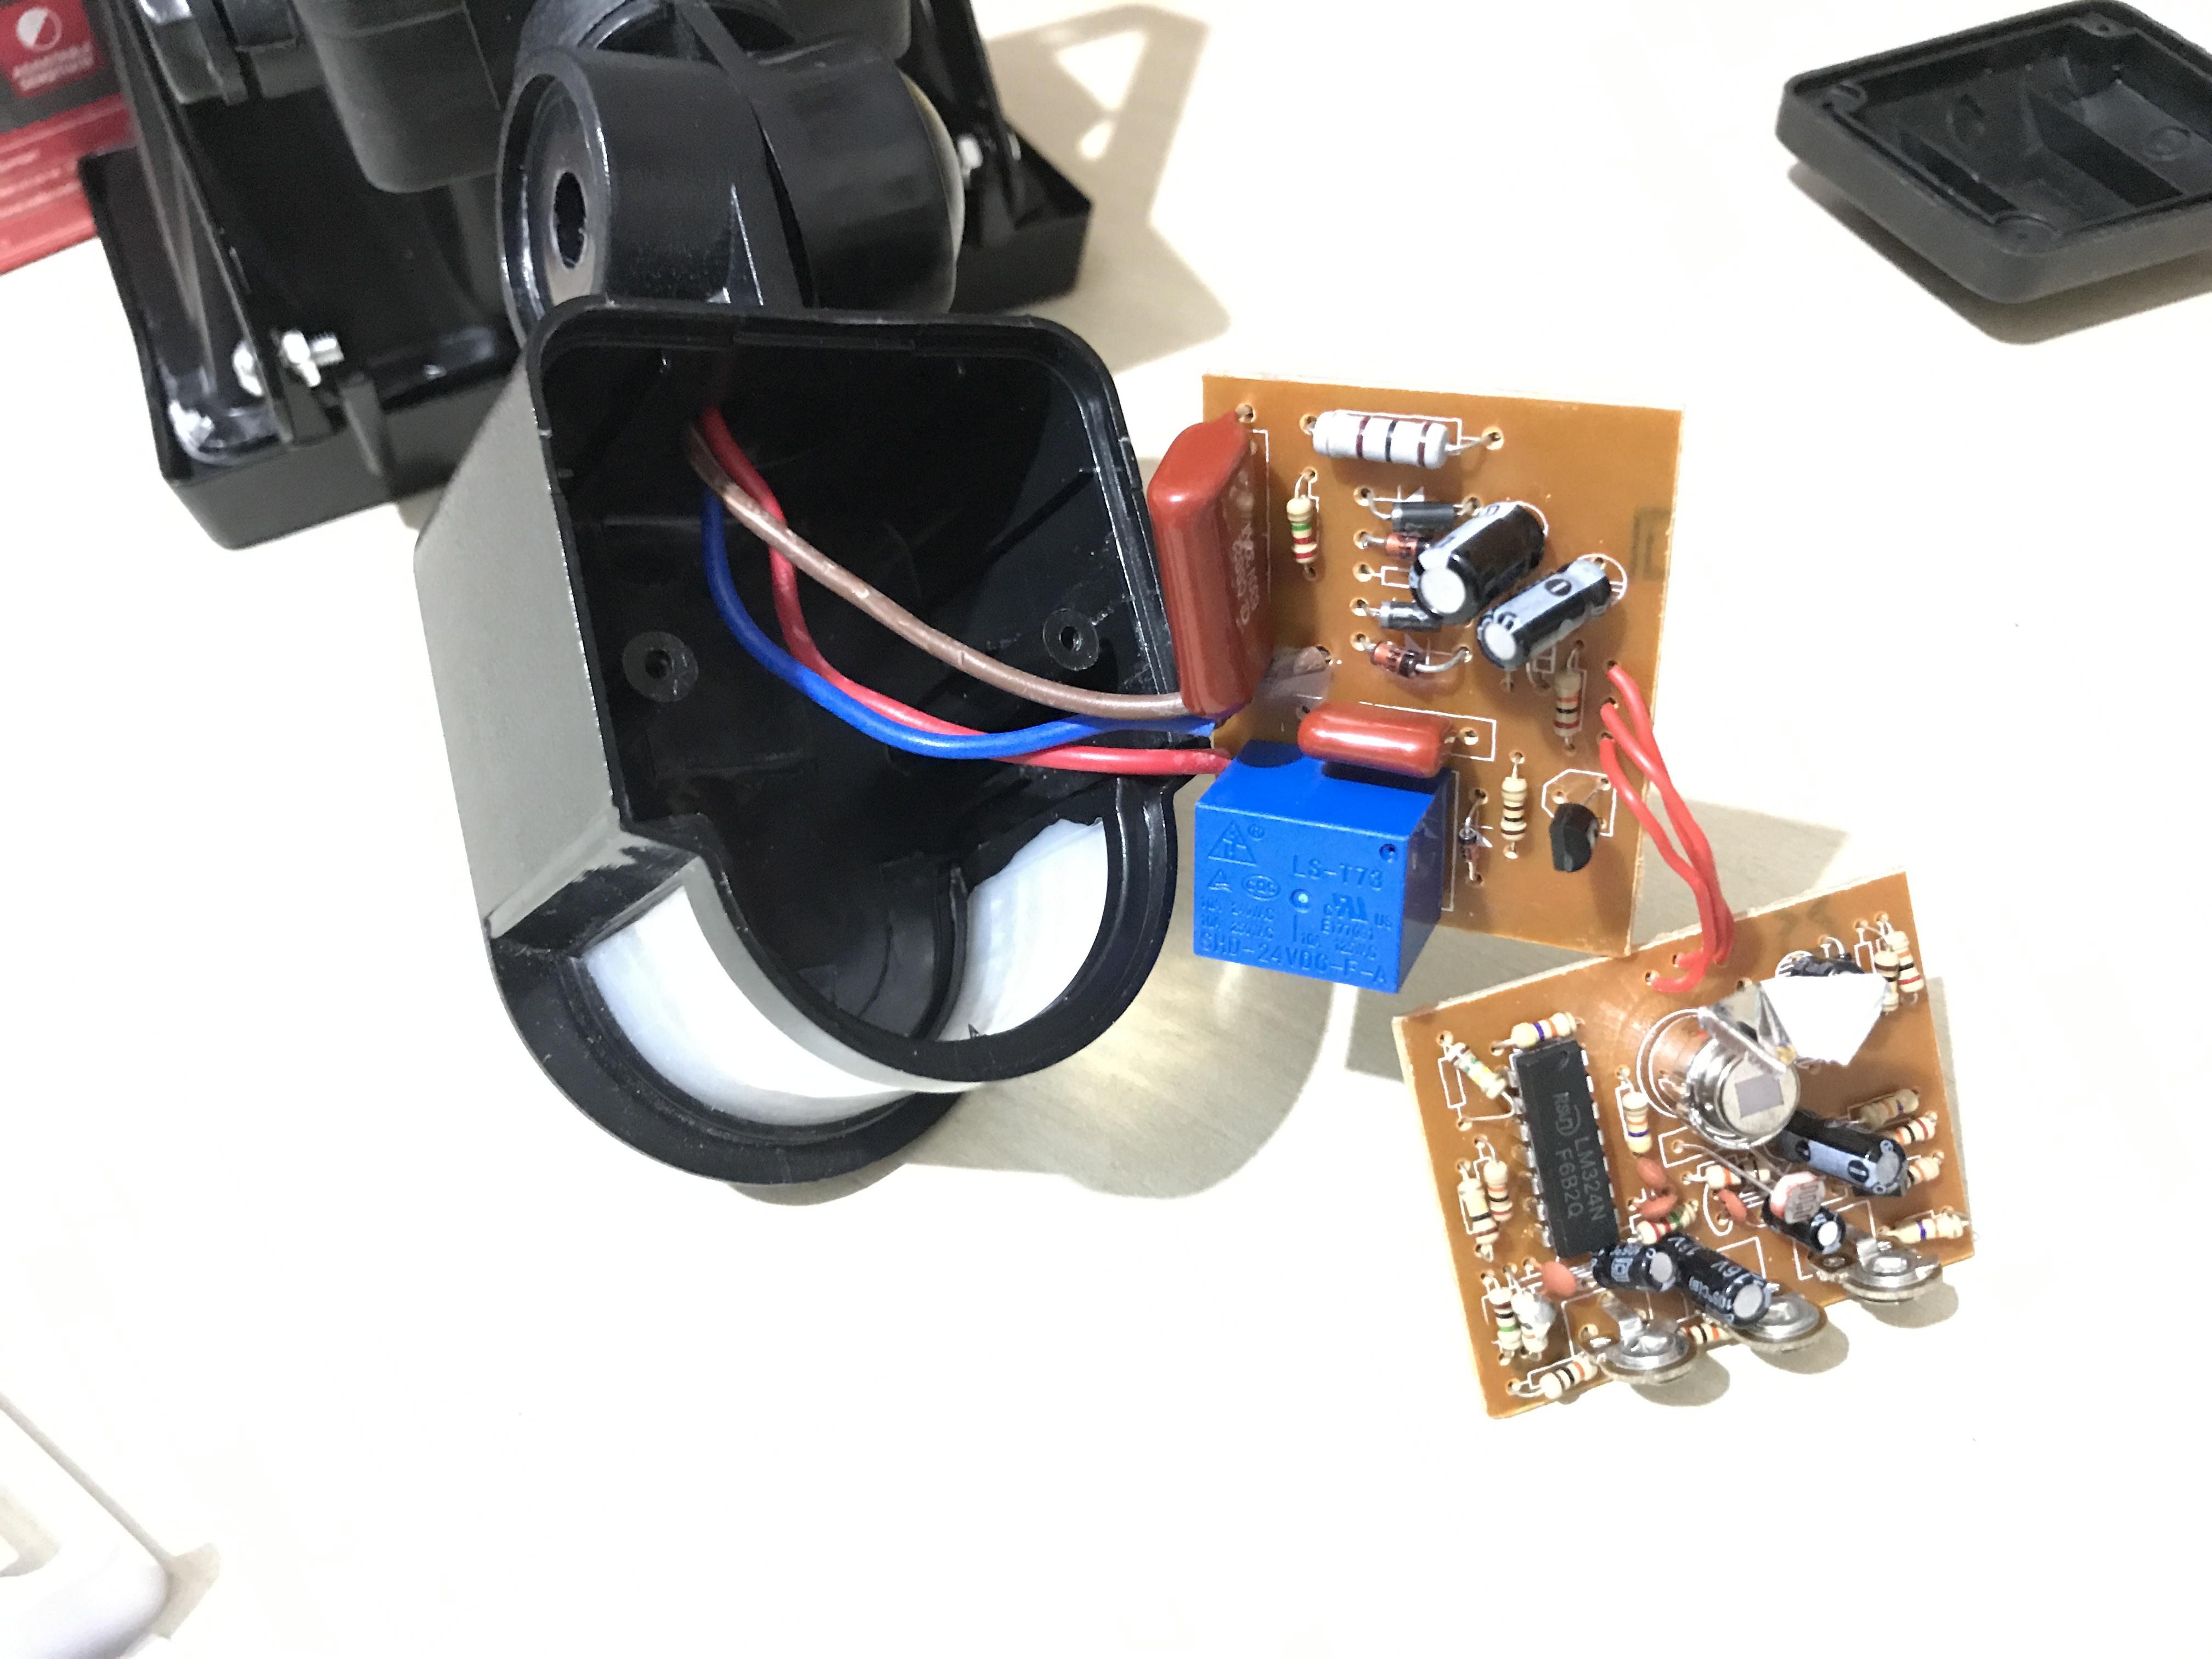 Picture of Remove the PIR Sensor